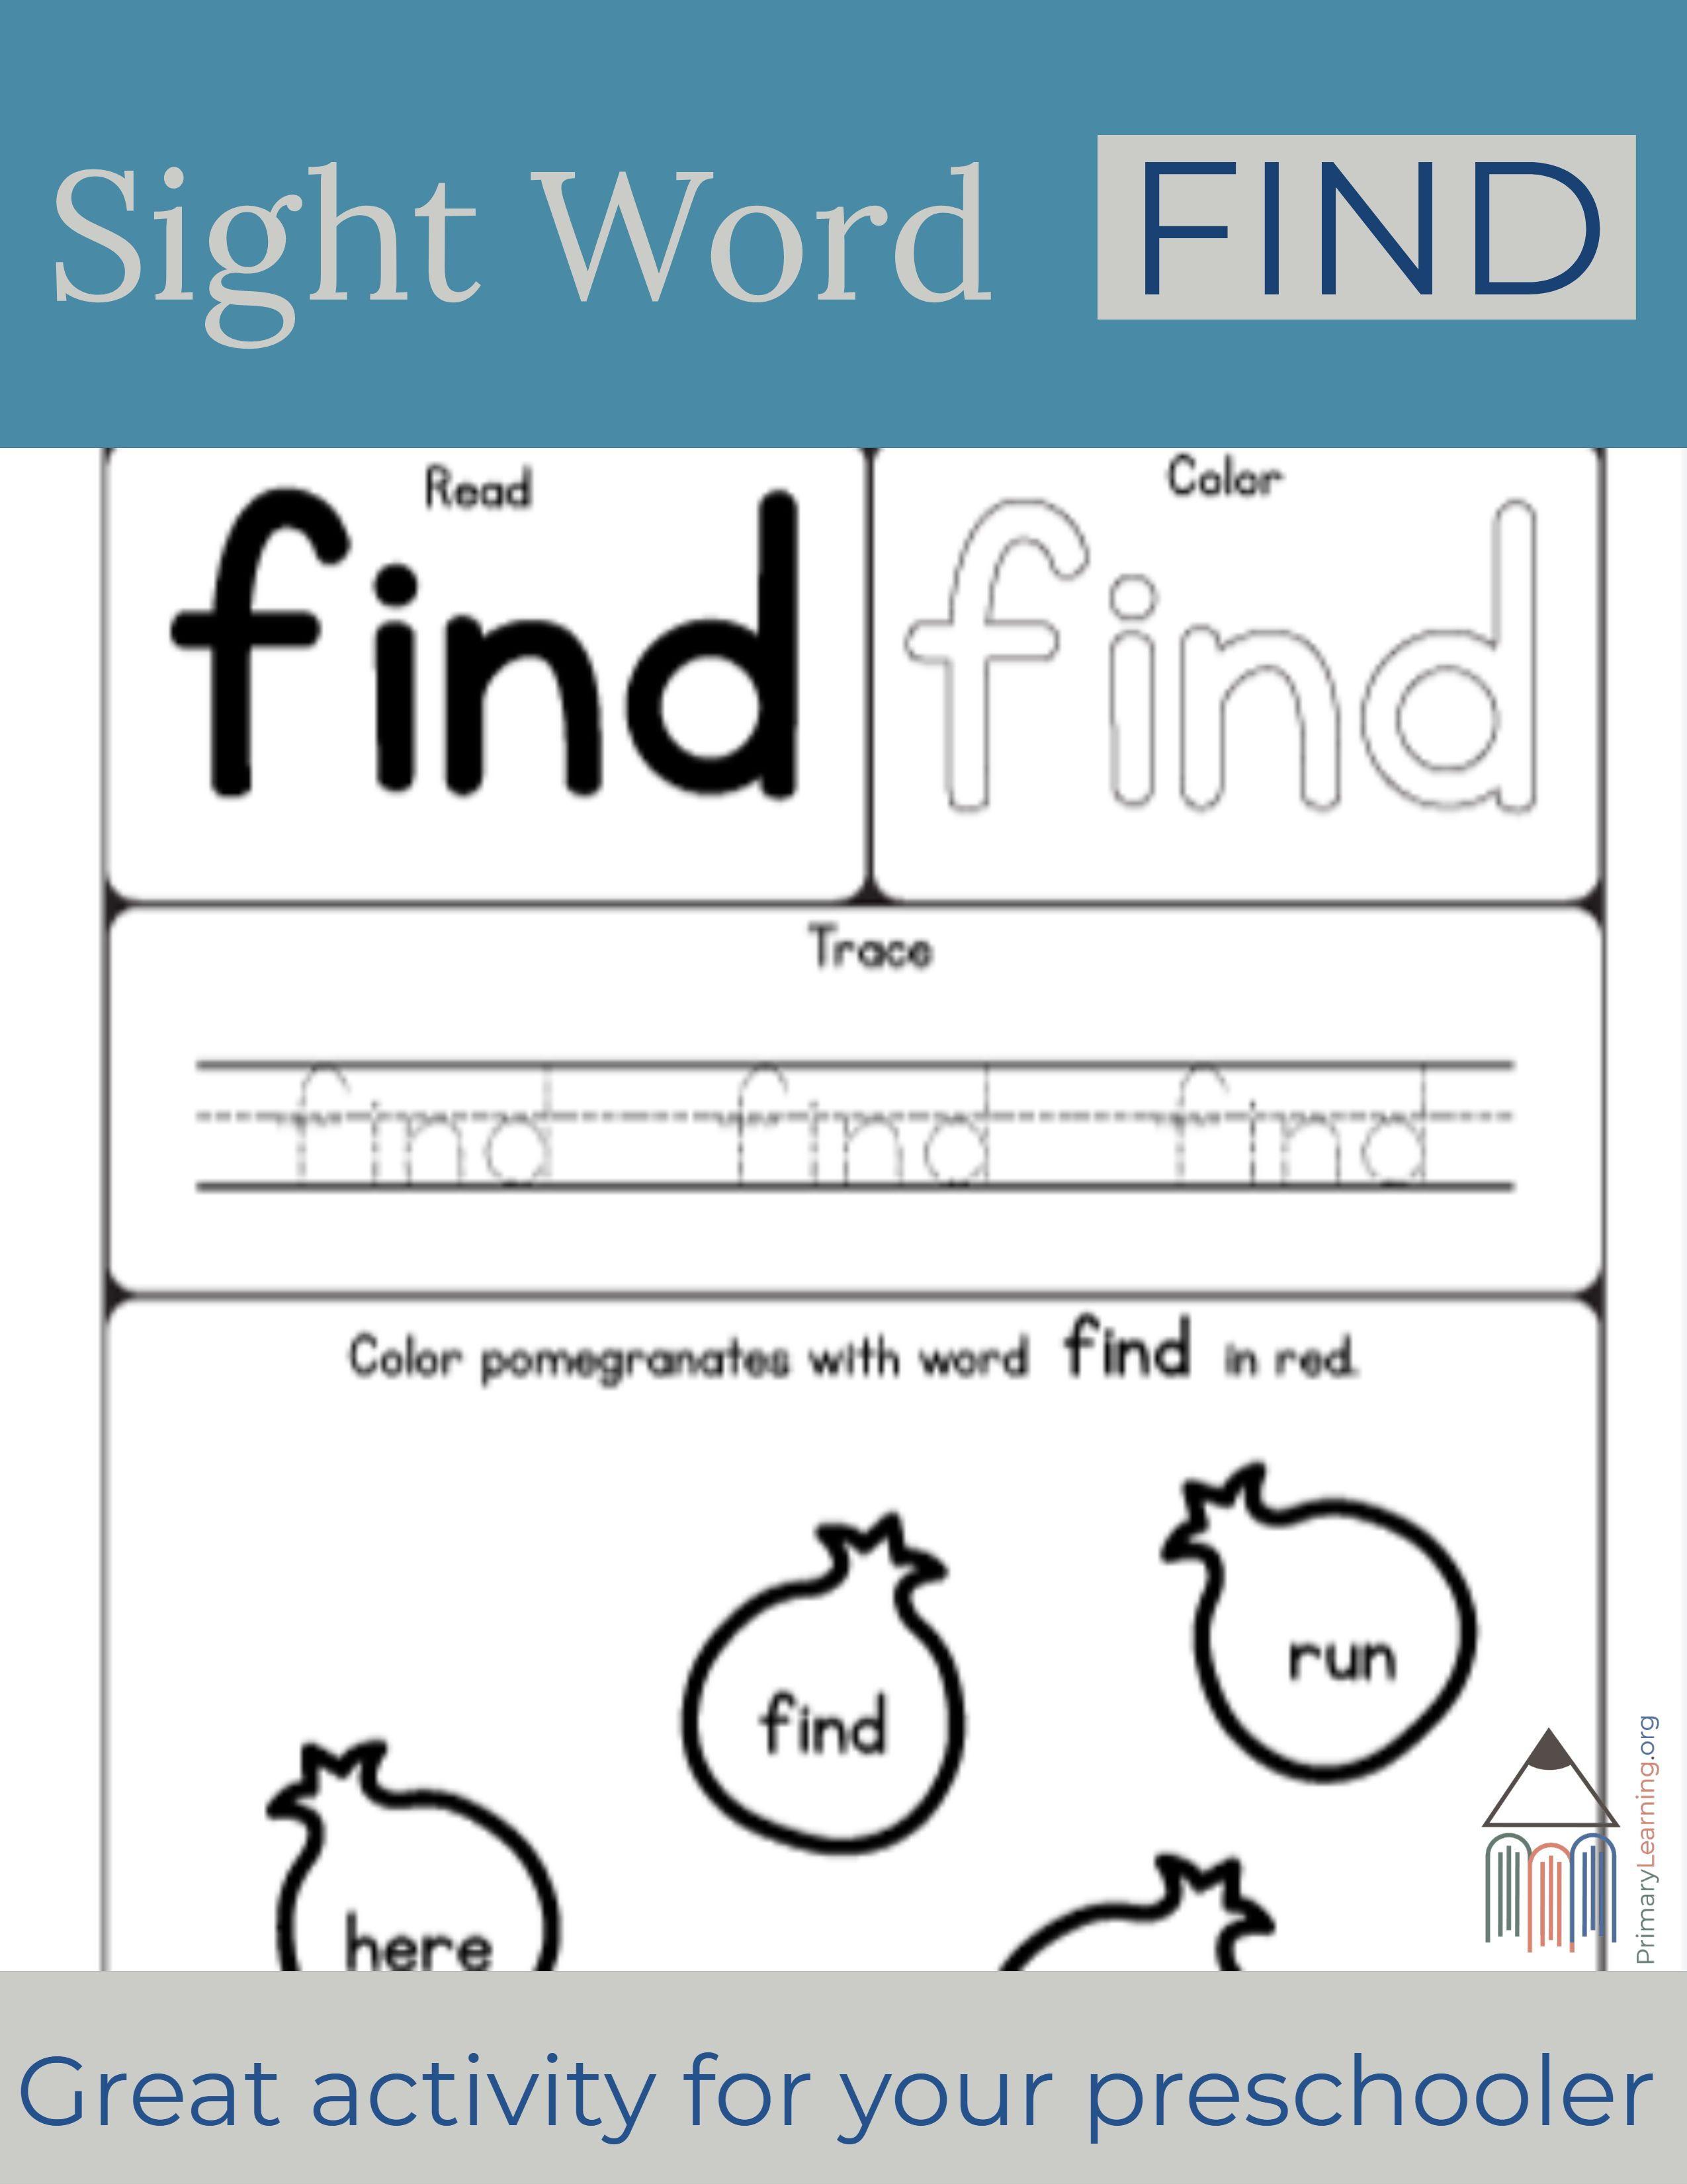 Sight Word Find Worksheet